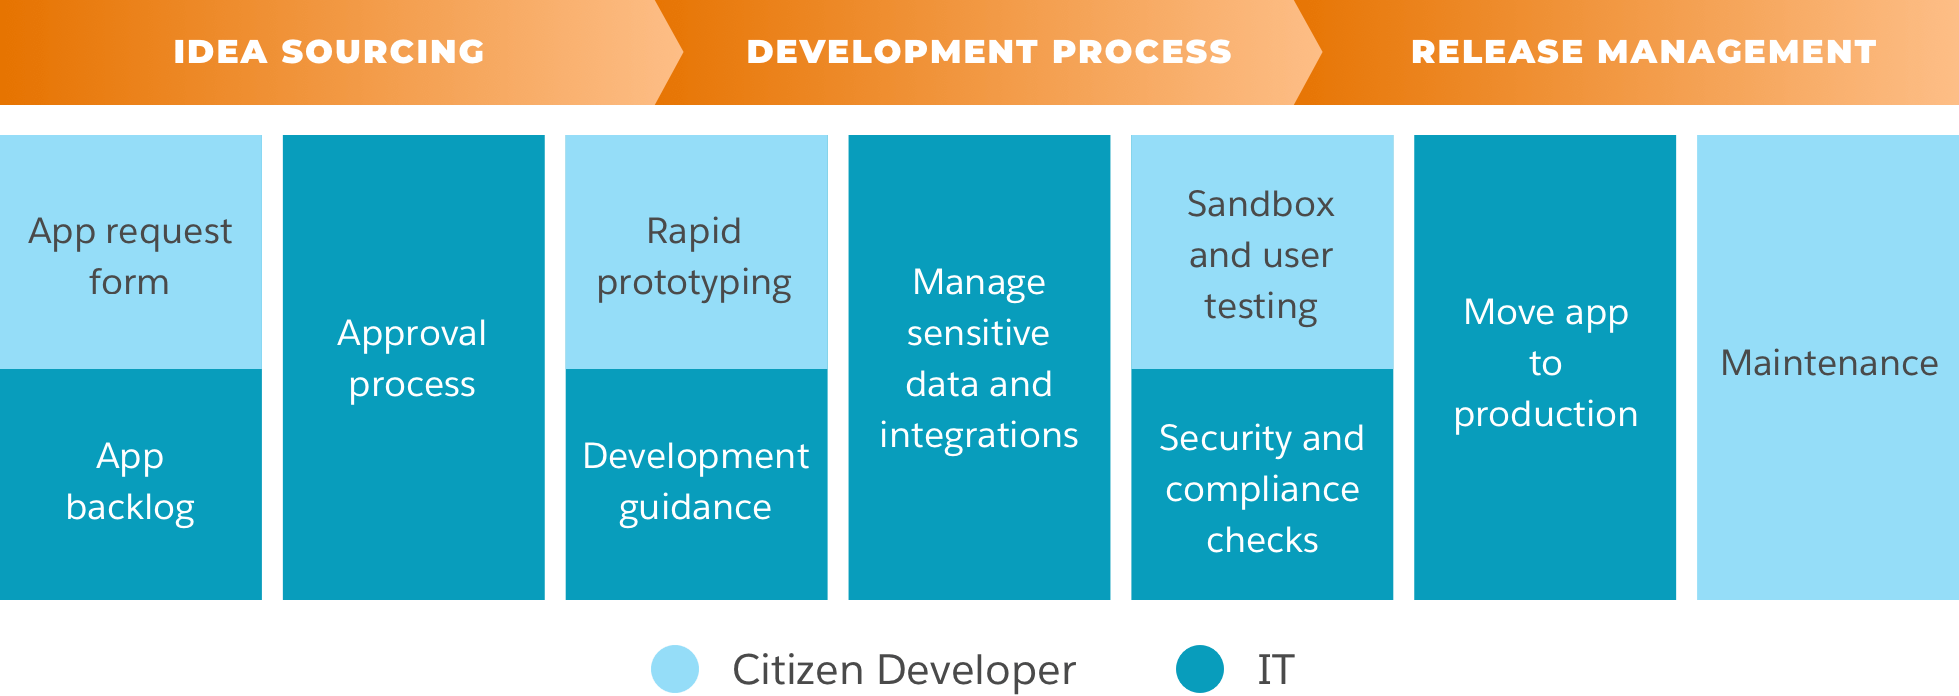 Idea Sourcing, Development Process, and Release management flow.